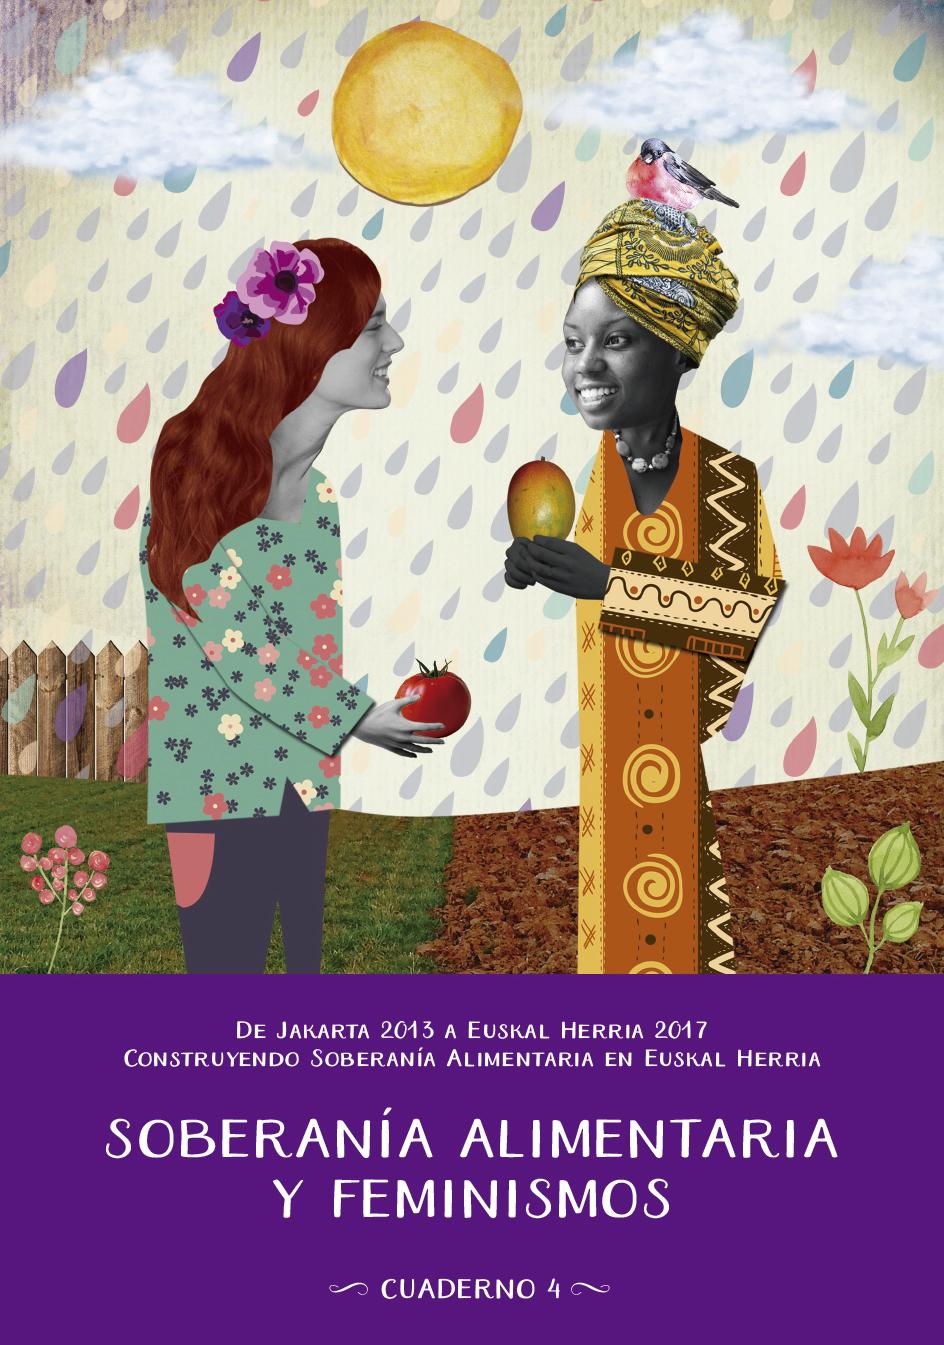 SOBERANIA ALIMENTARIA Y FEMINISMOS-1